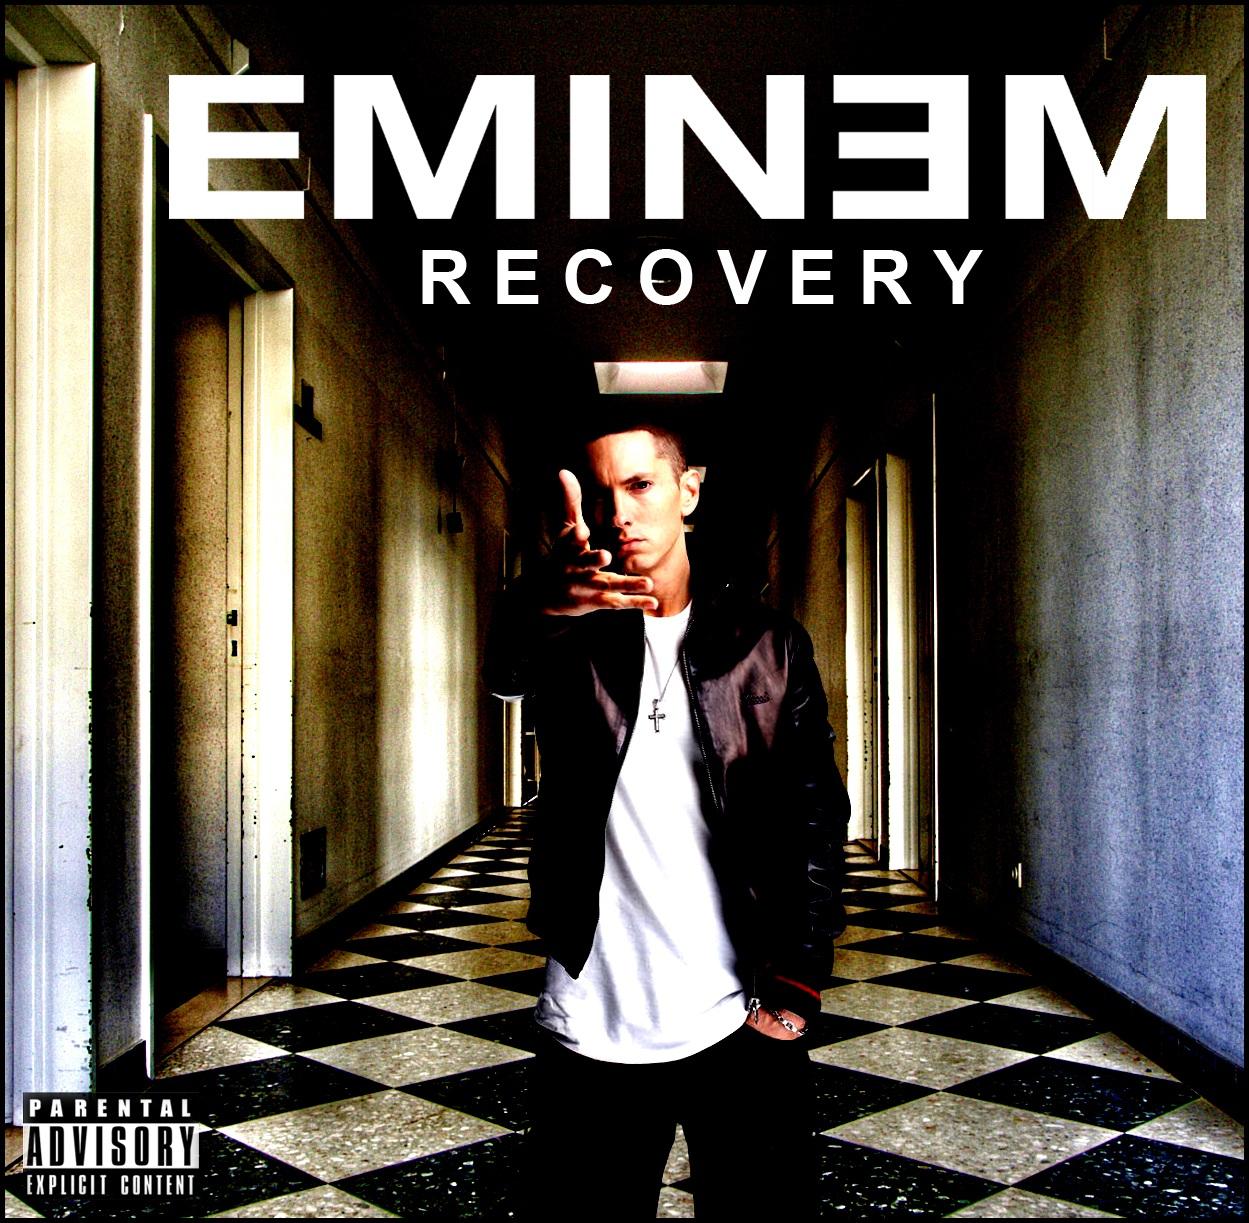 Talkin' 2 Myself (feat. Kobe Honeycutt) - Eminem: testo tradotto - Traduzione in italiano